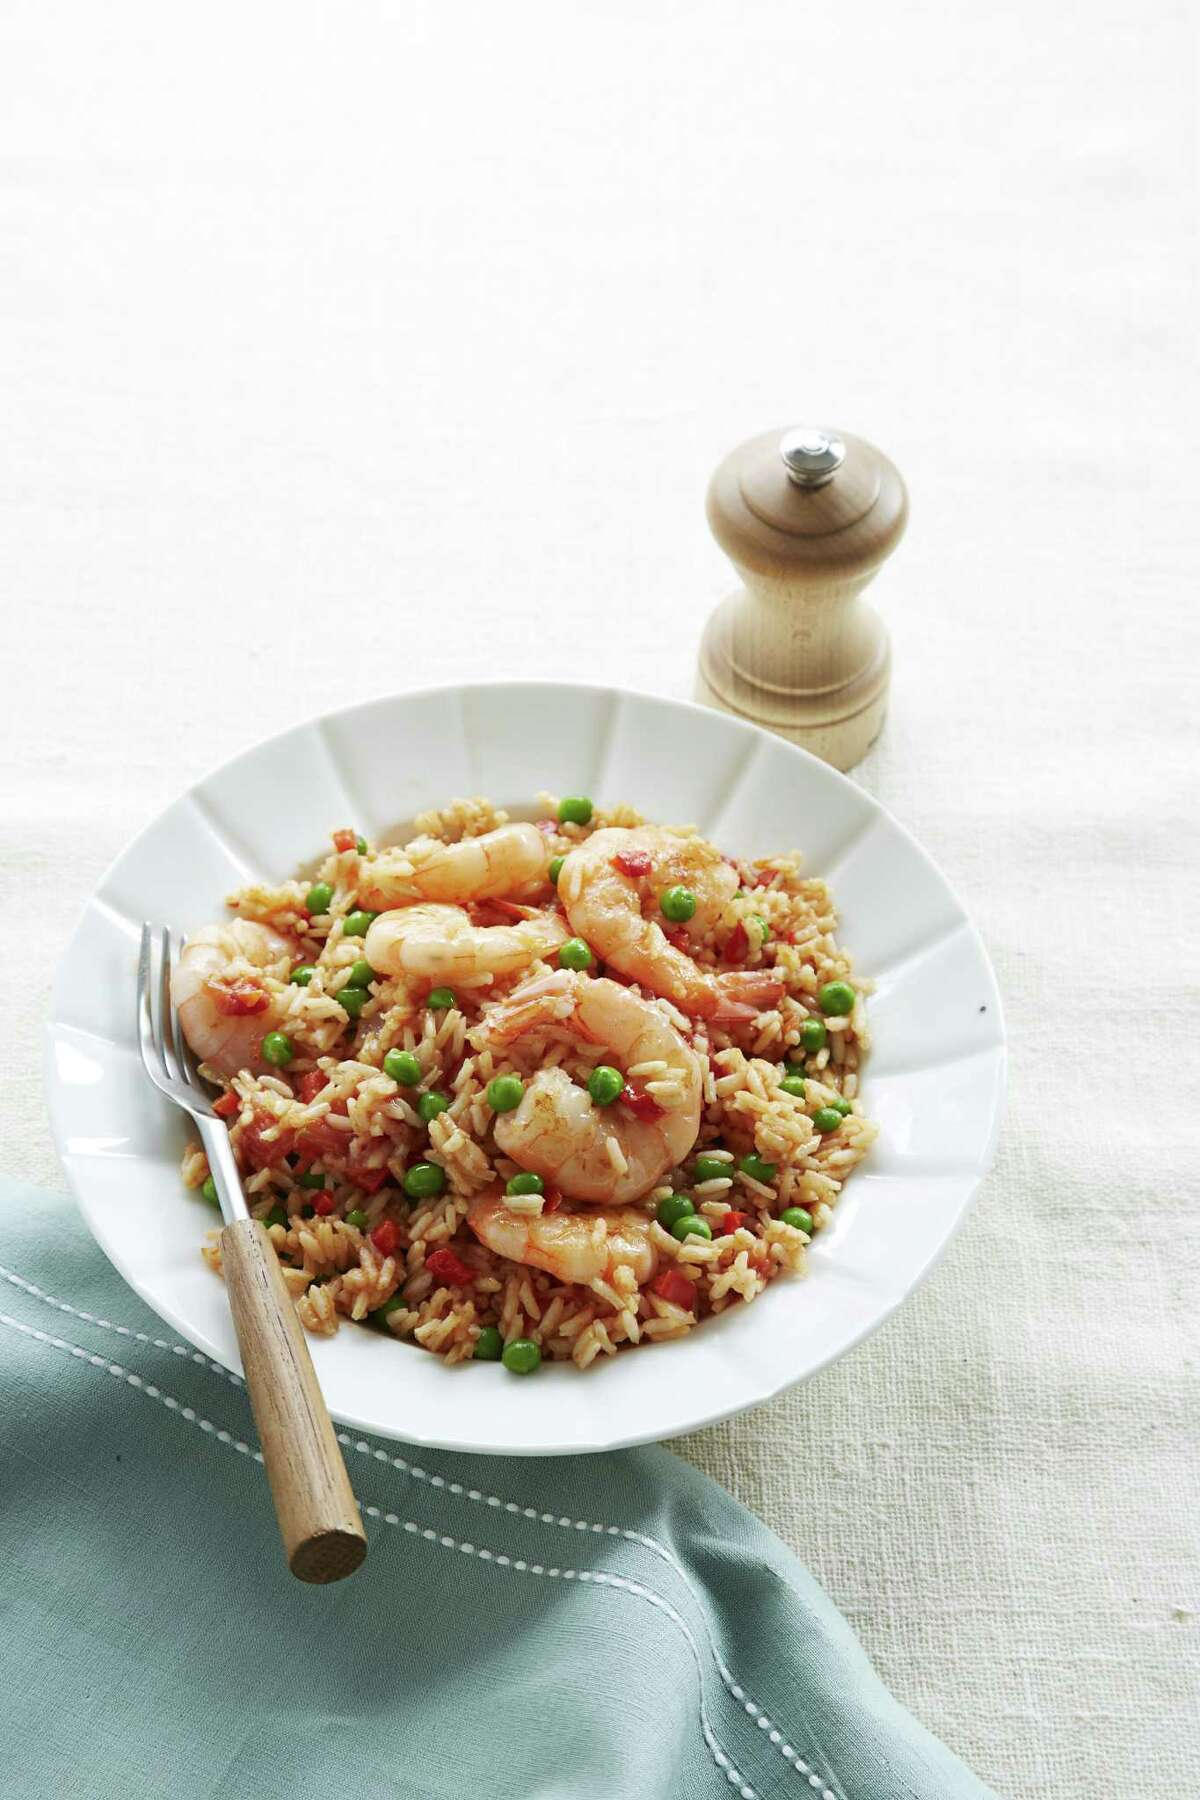 Good Housekeeping recipe for Easy Shrimp Paella.